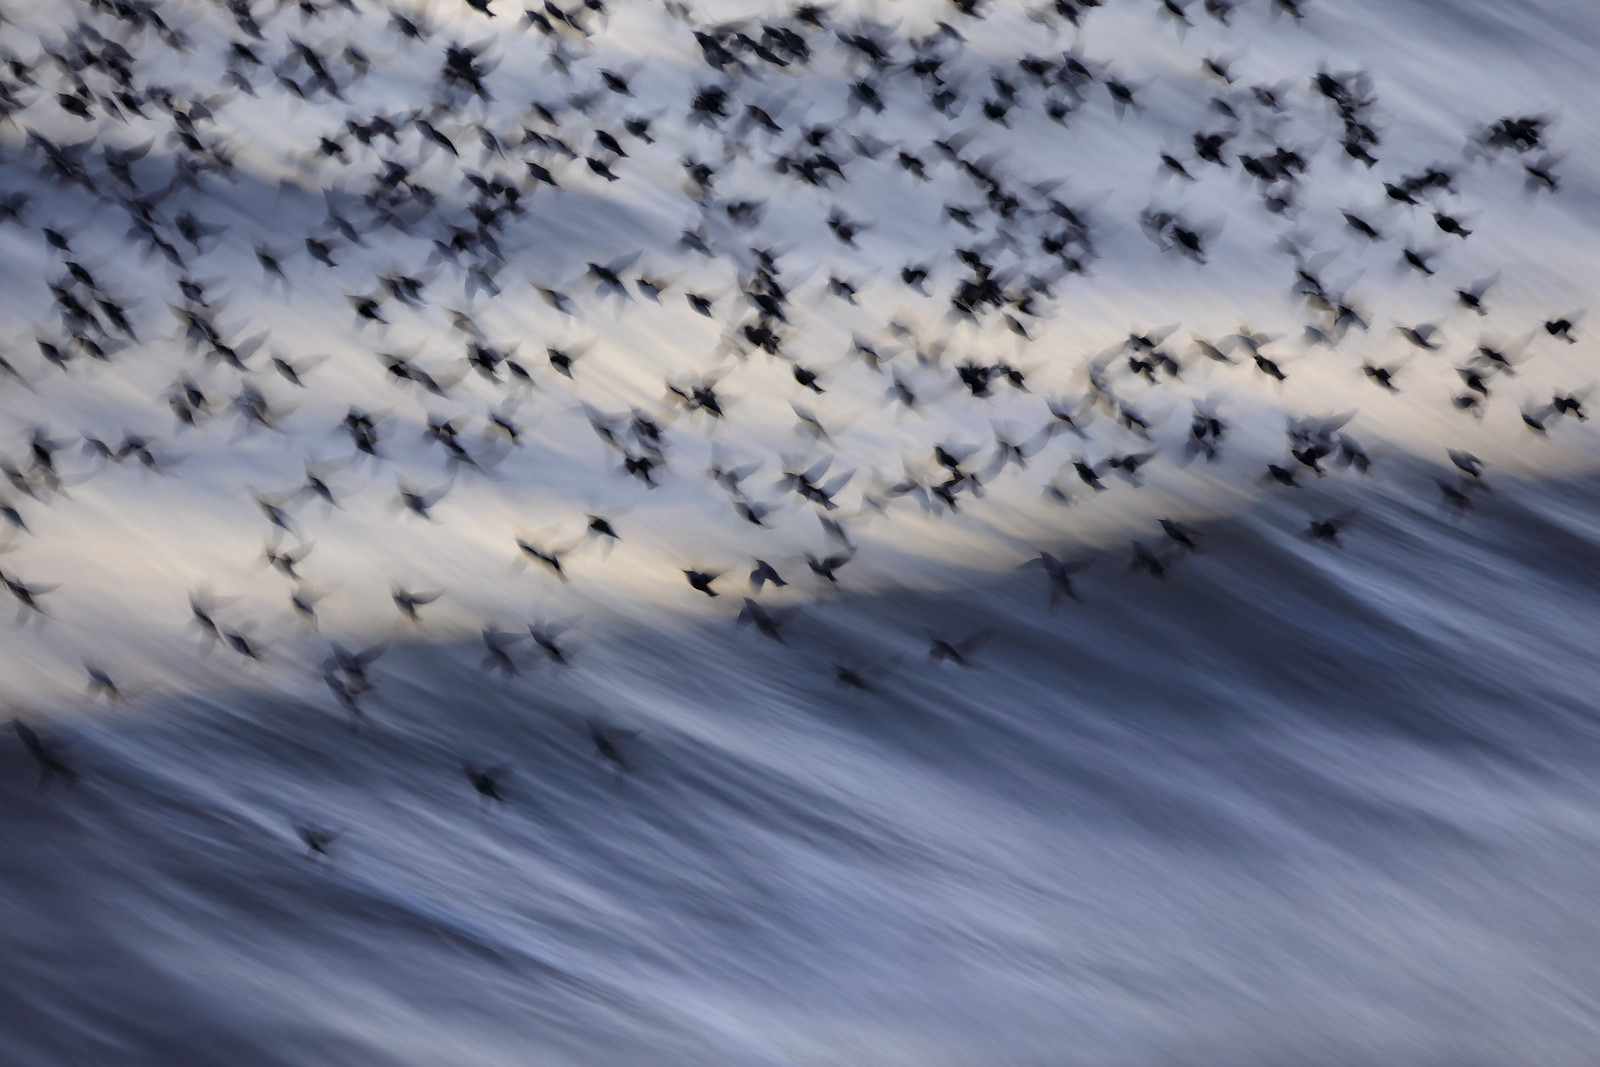 Starling Blurmuration over Sea